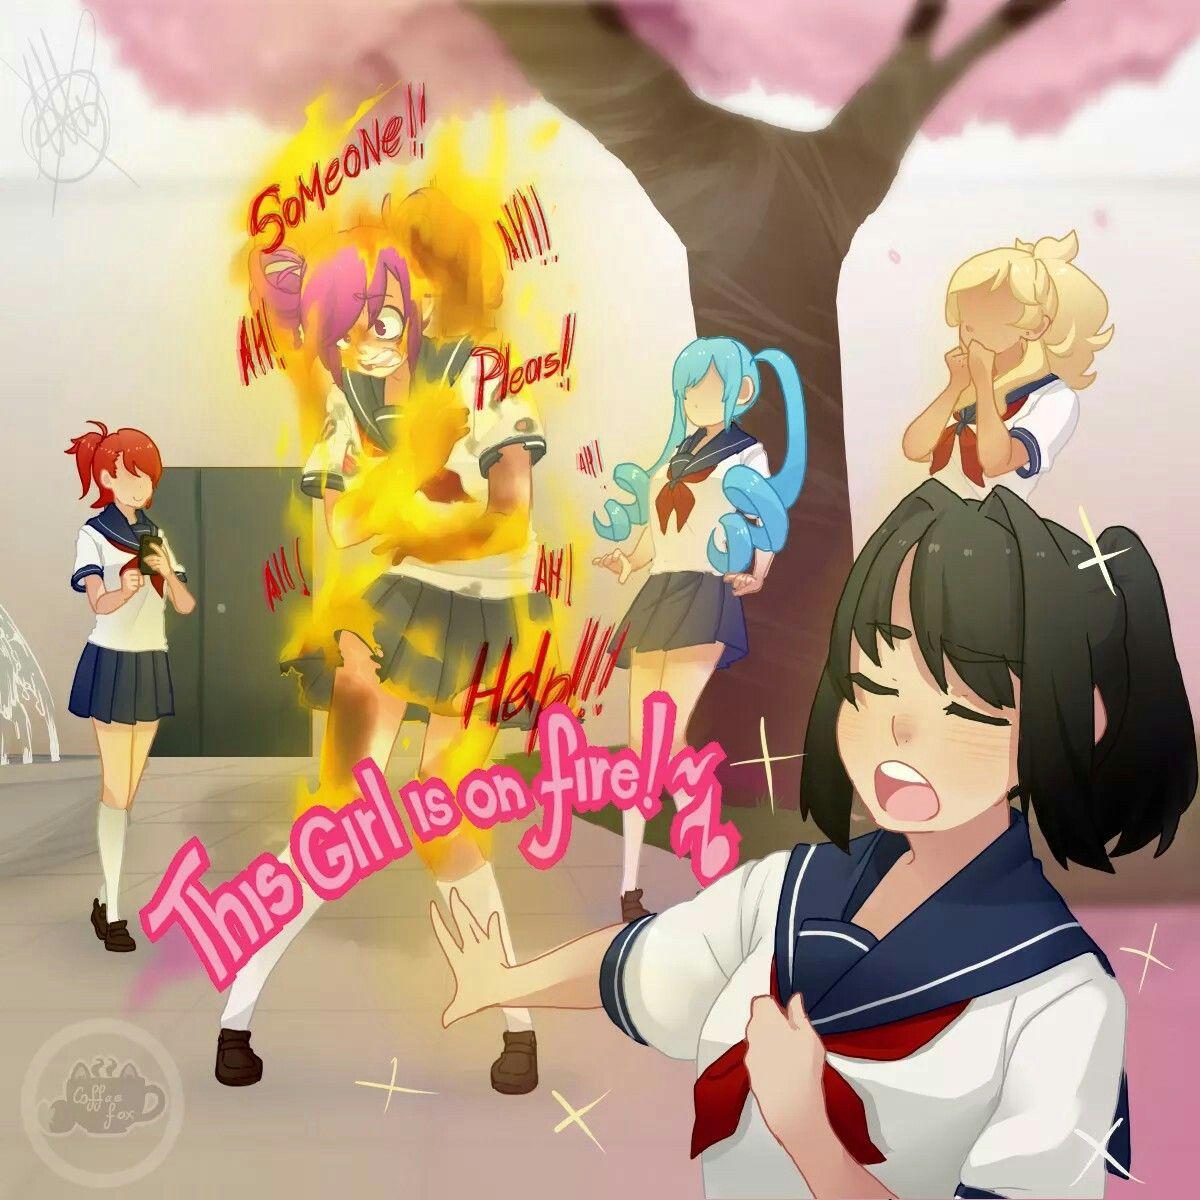 Game development blog yandere classmates anime pinterest nice - Explore Sad Anime Yandere Simulator And More